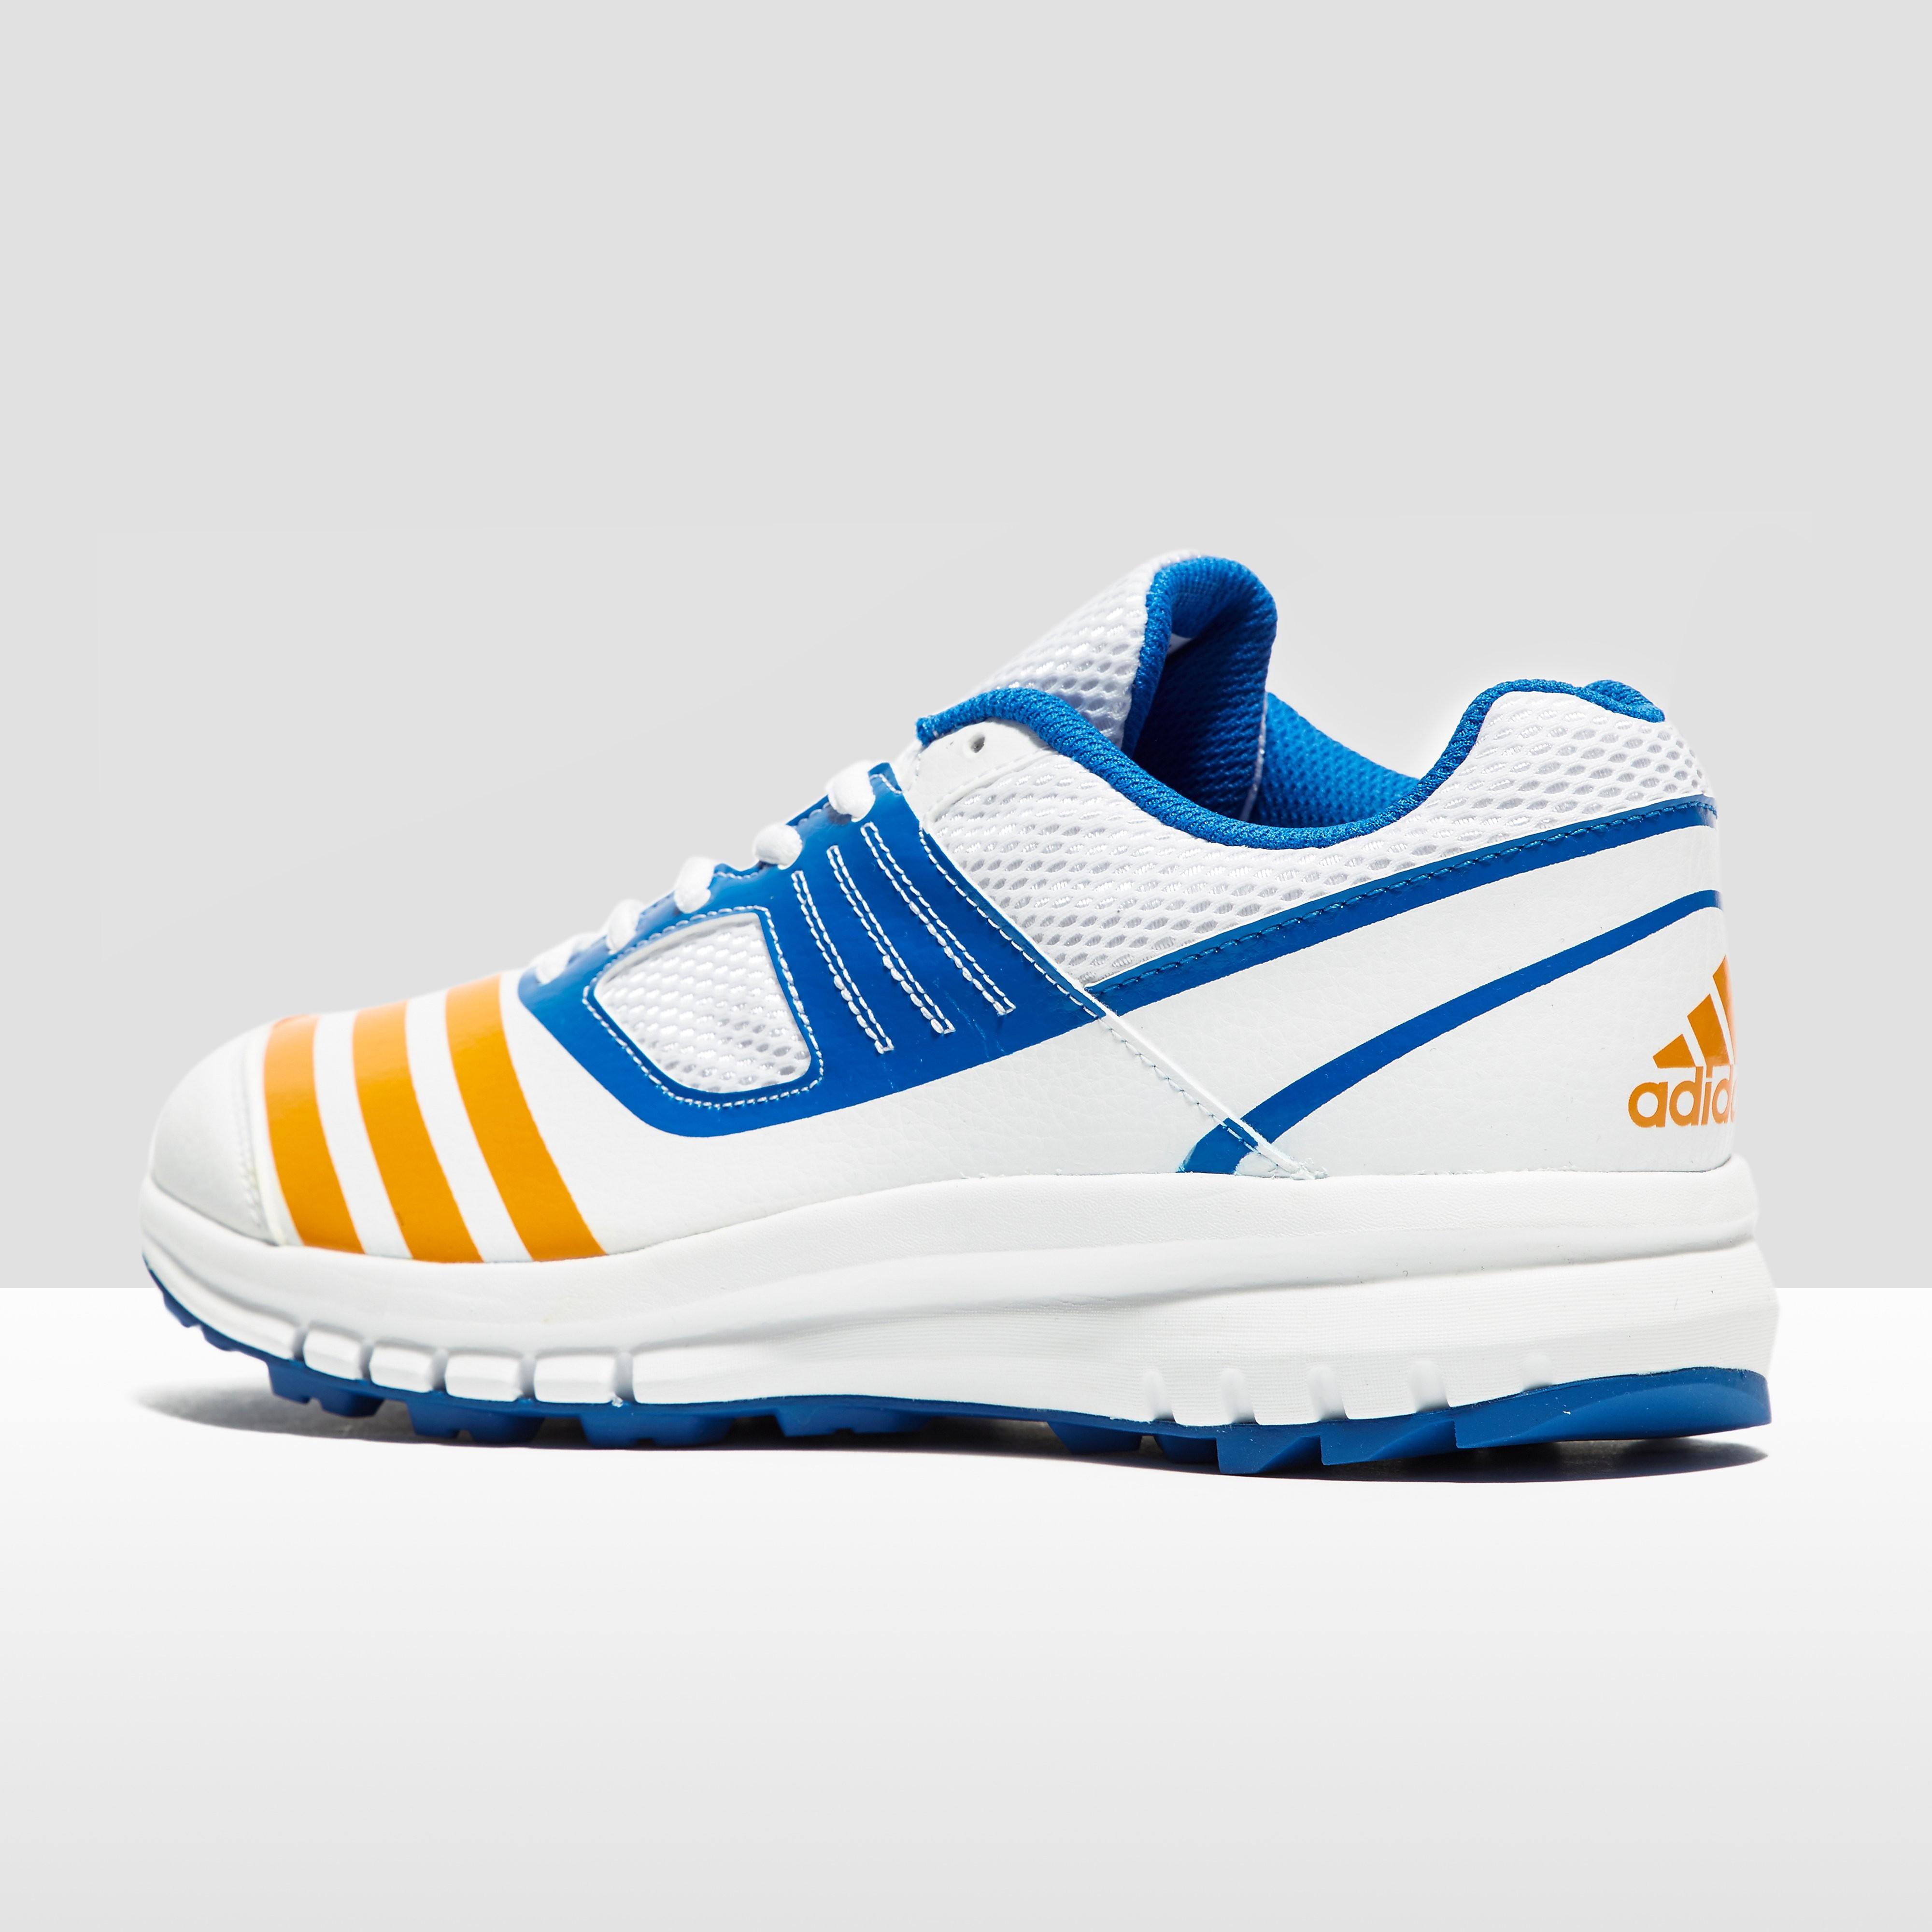 adidas Howzat AR Men's Cricket Shoes